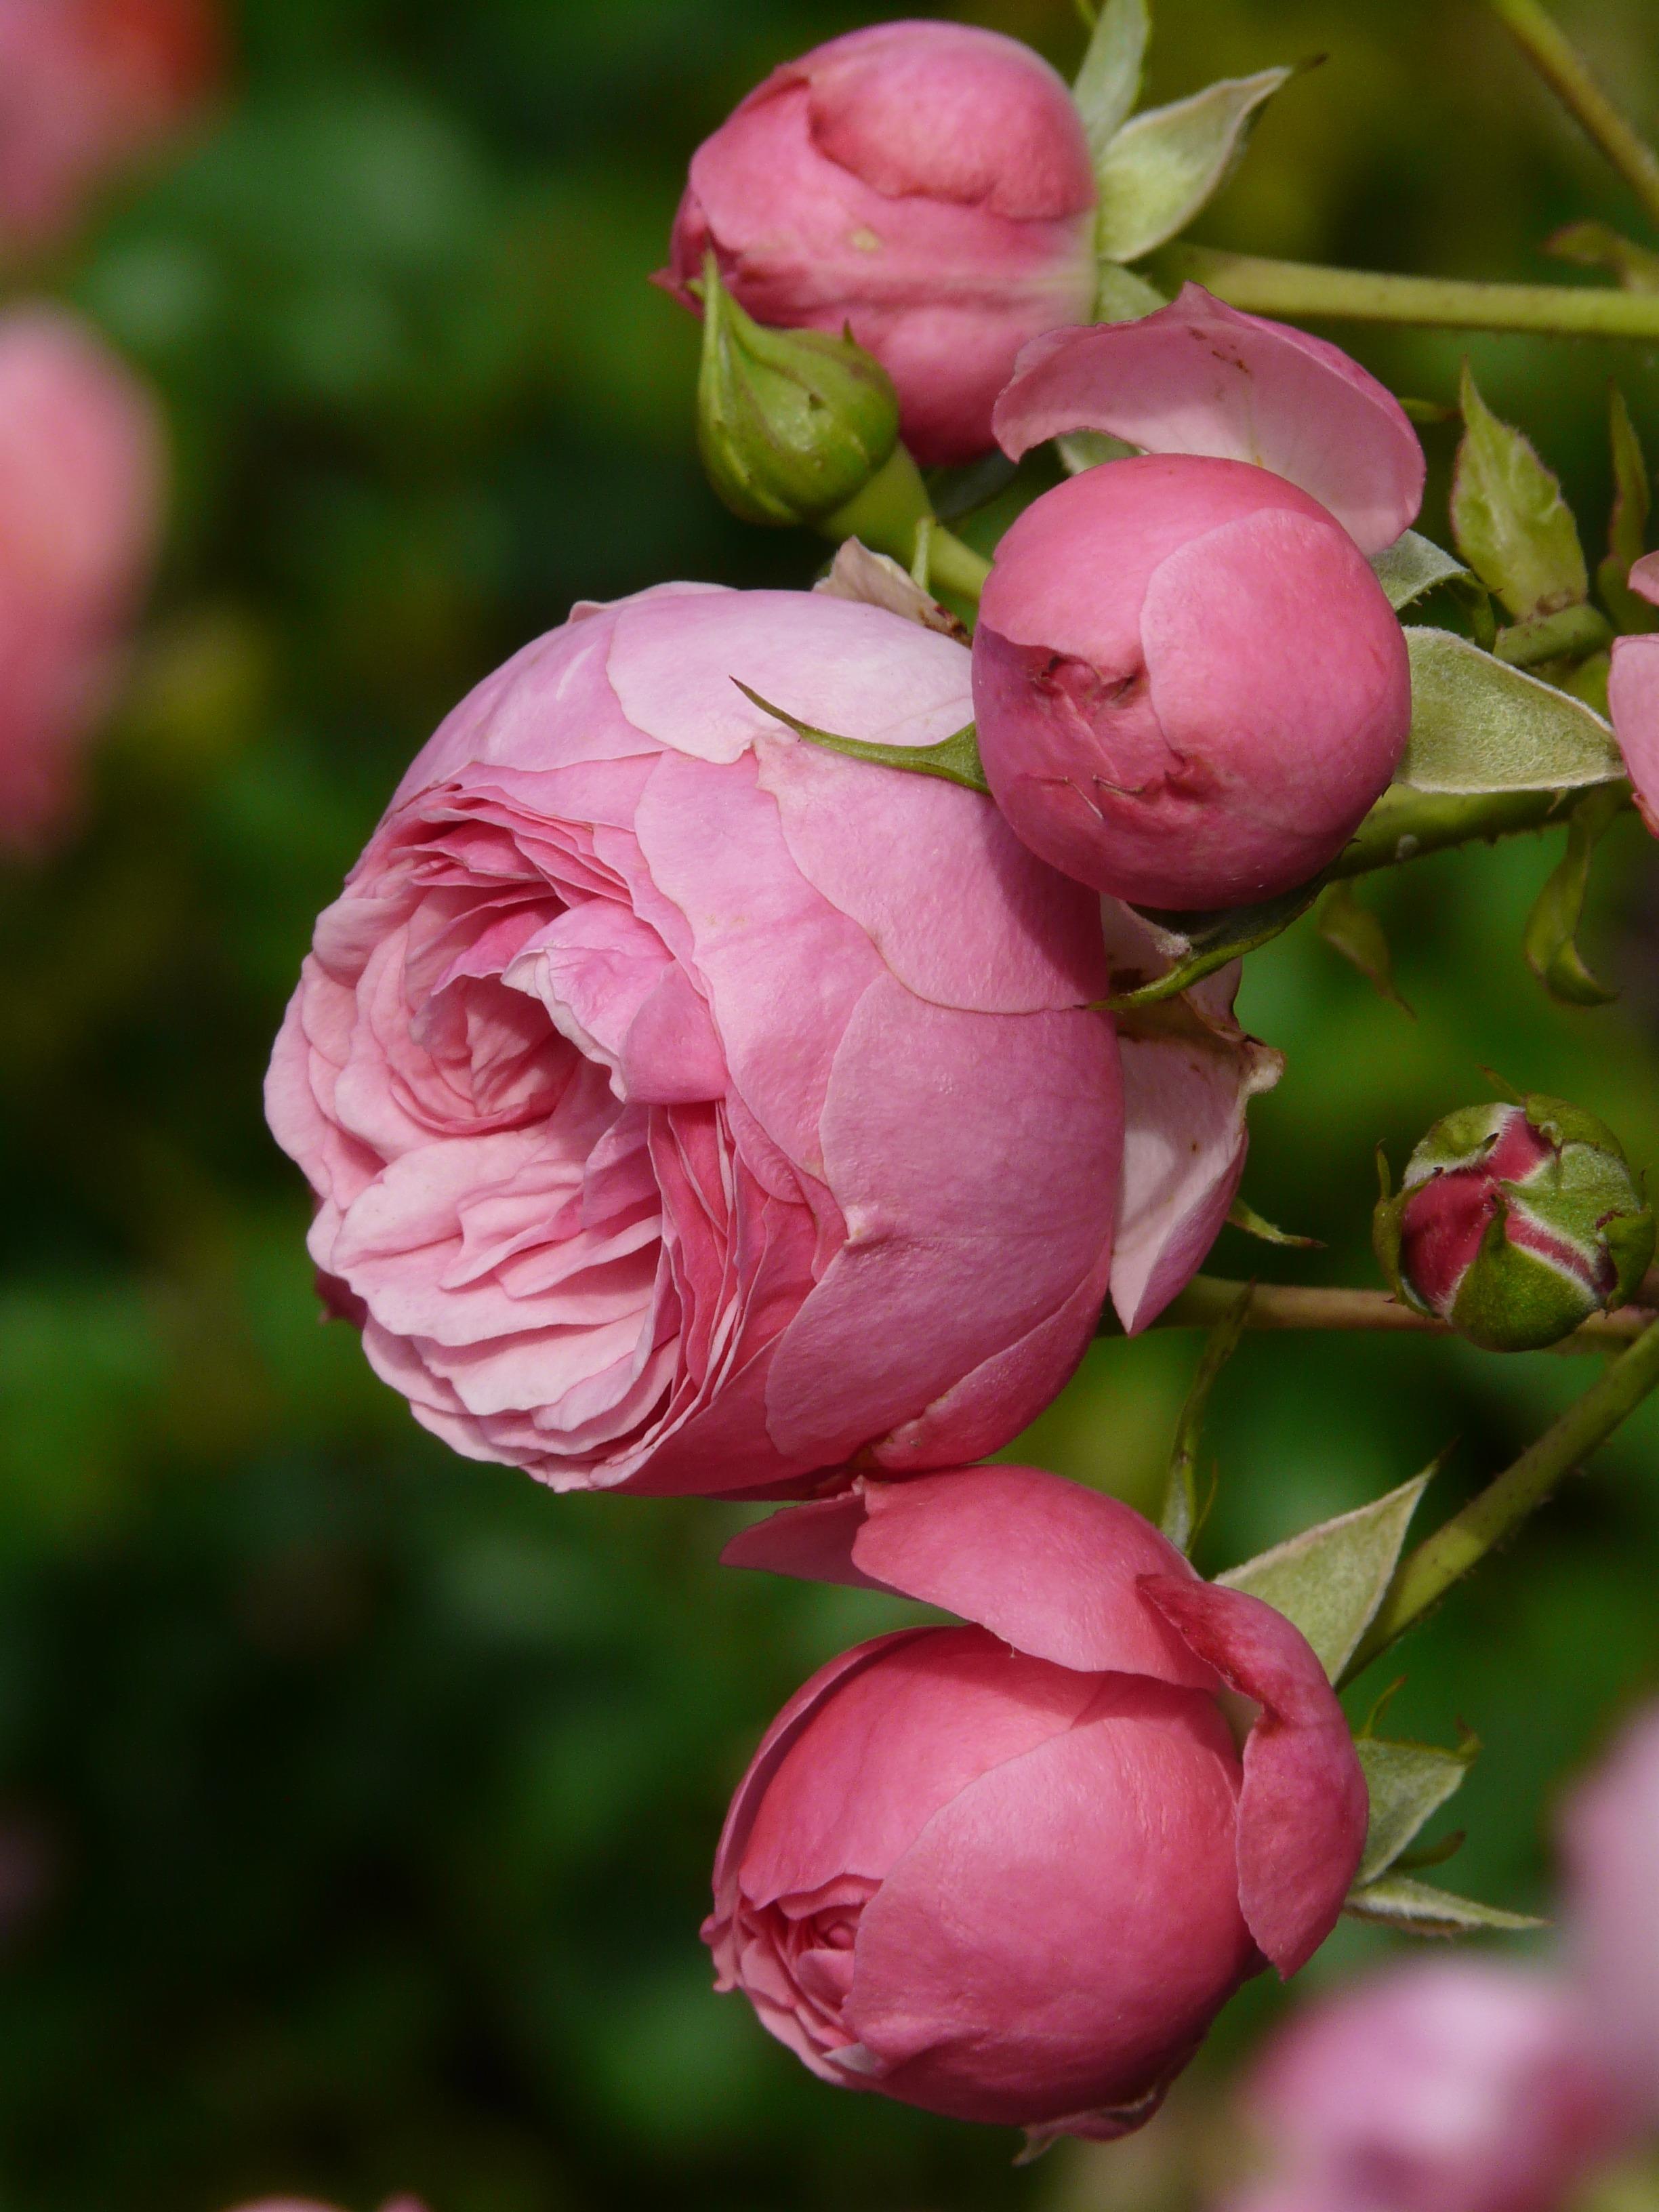 Free Images Blossom Petal Color Botany Colorful Pink Flora